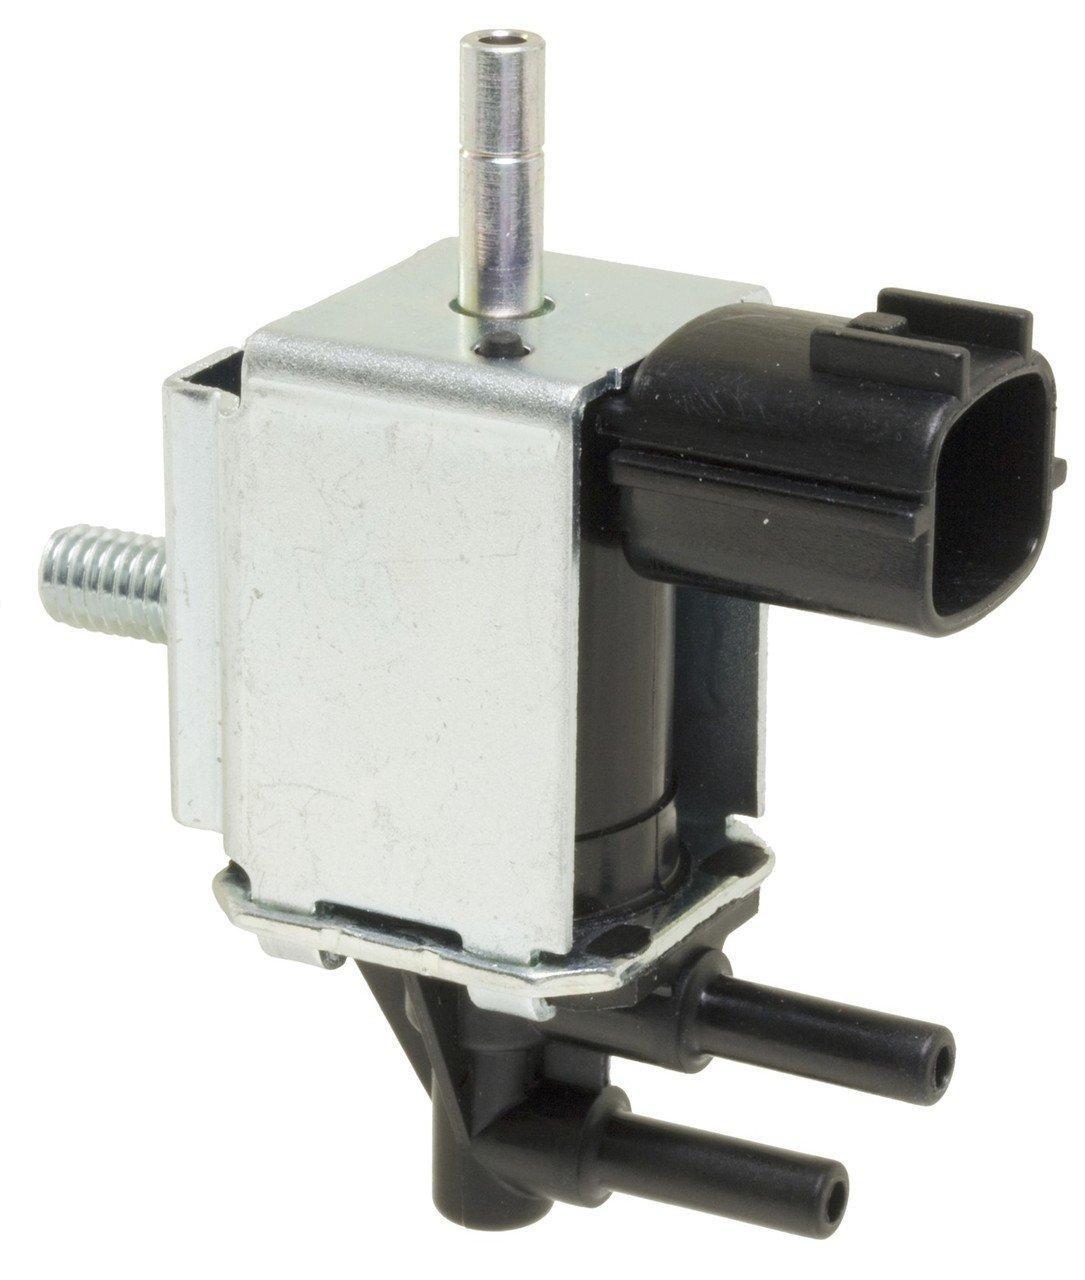 Airtex 2F1186 Exhaust Gas Recirculation Solenoid